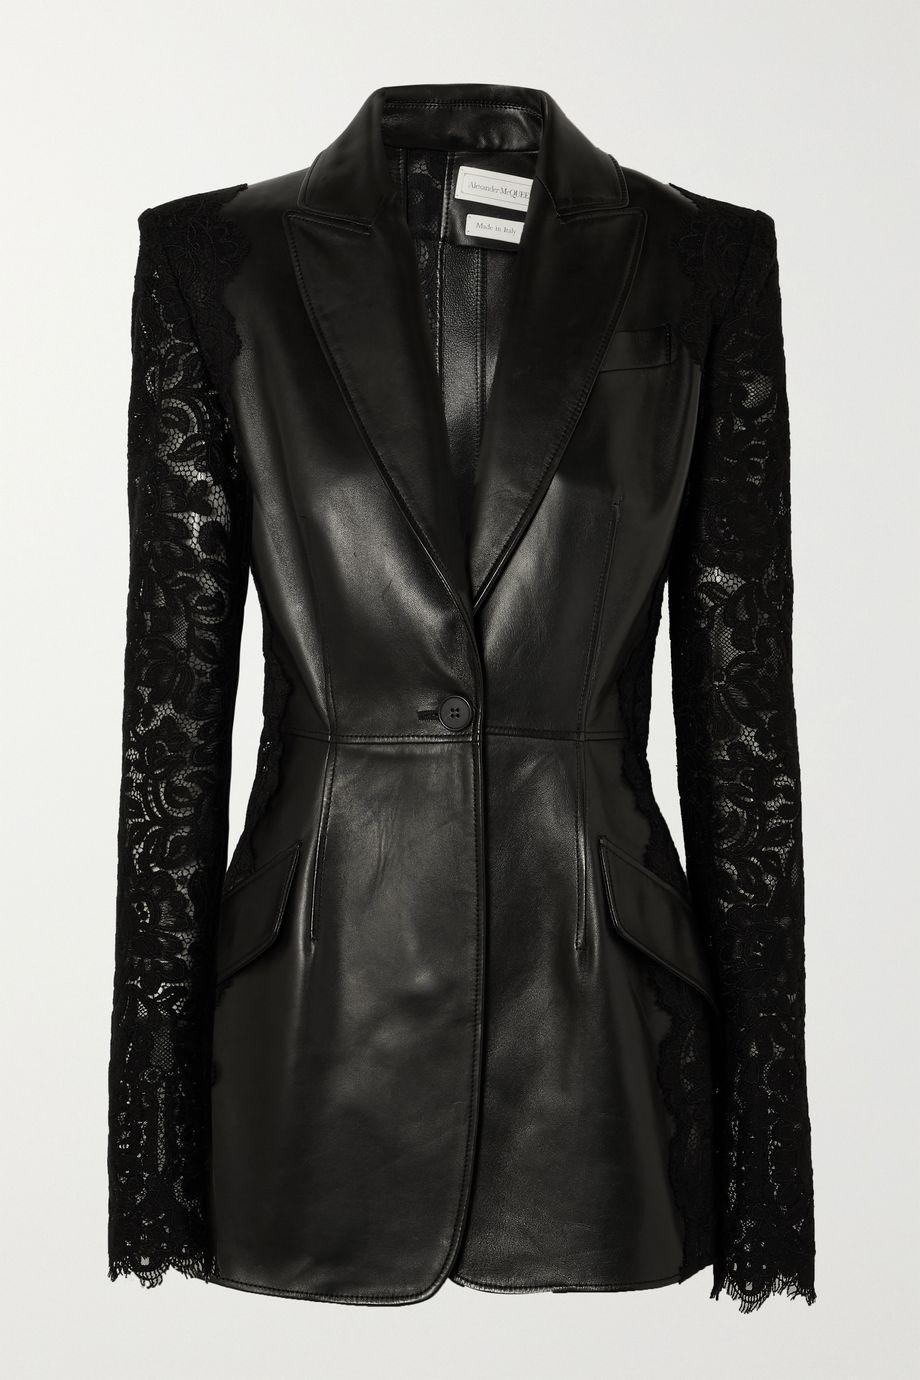 Alexander McQueen Lace-paneled leather blazer